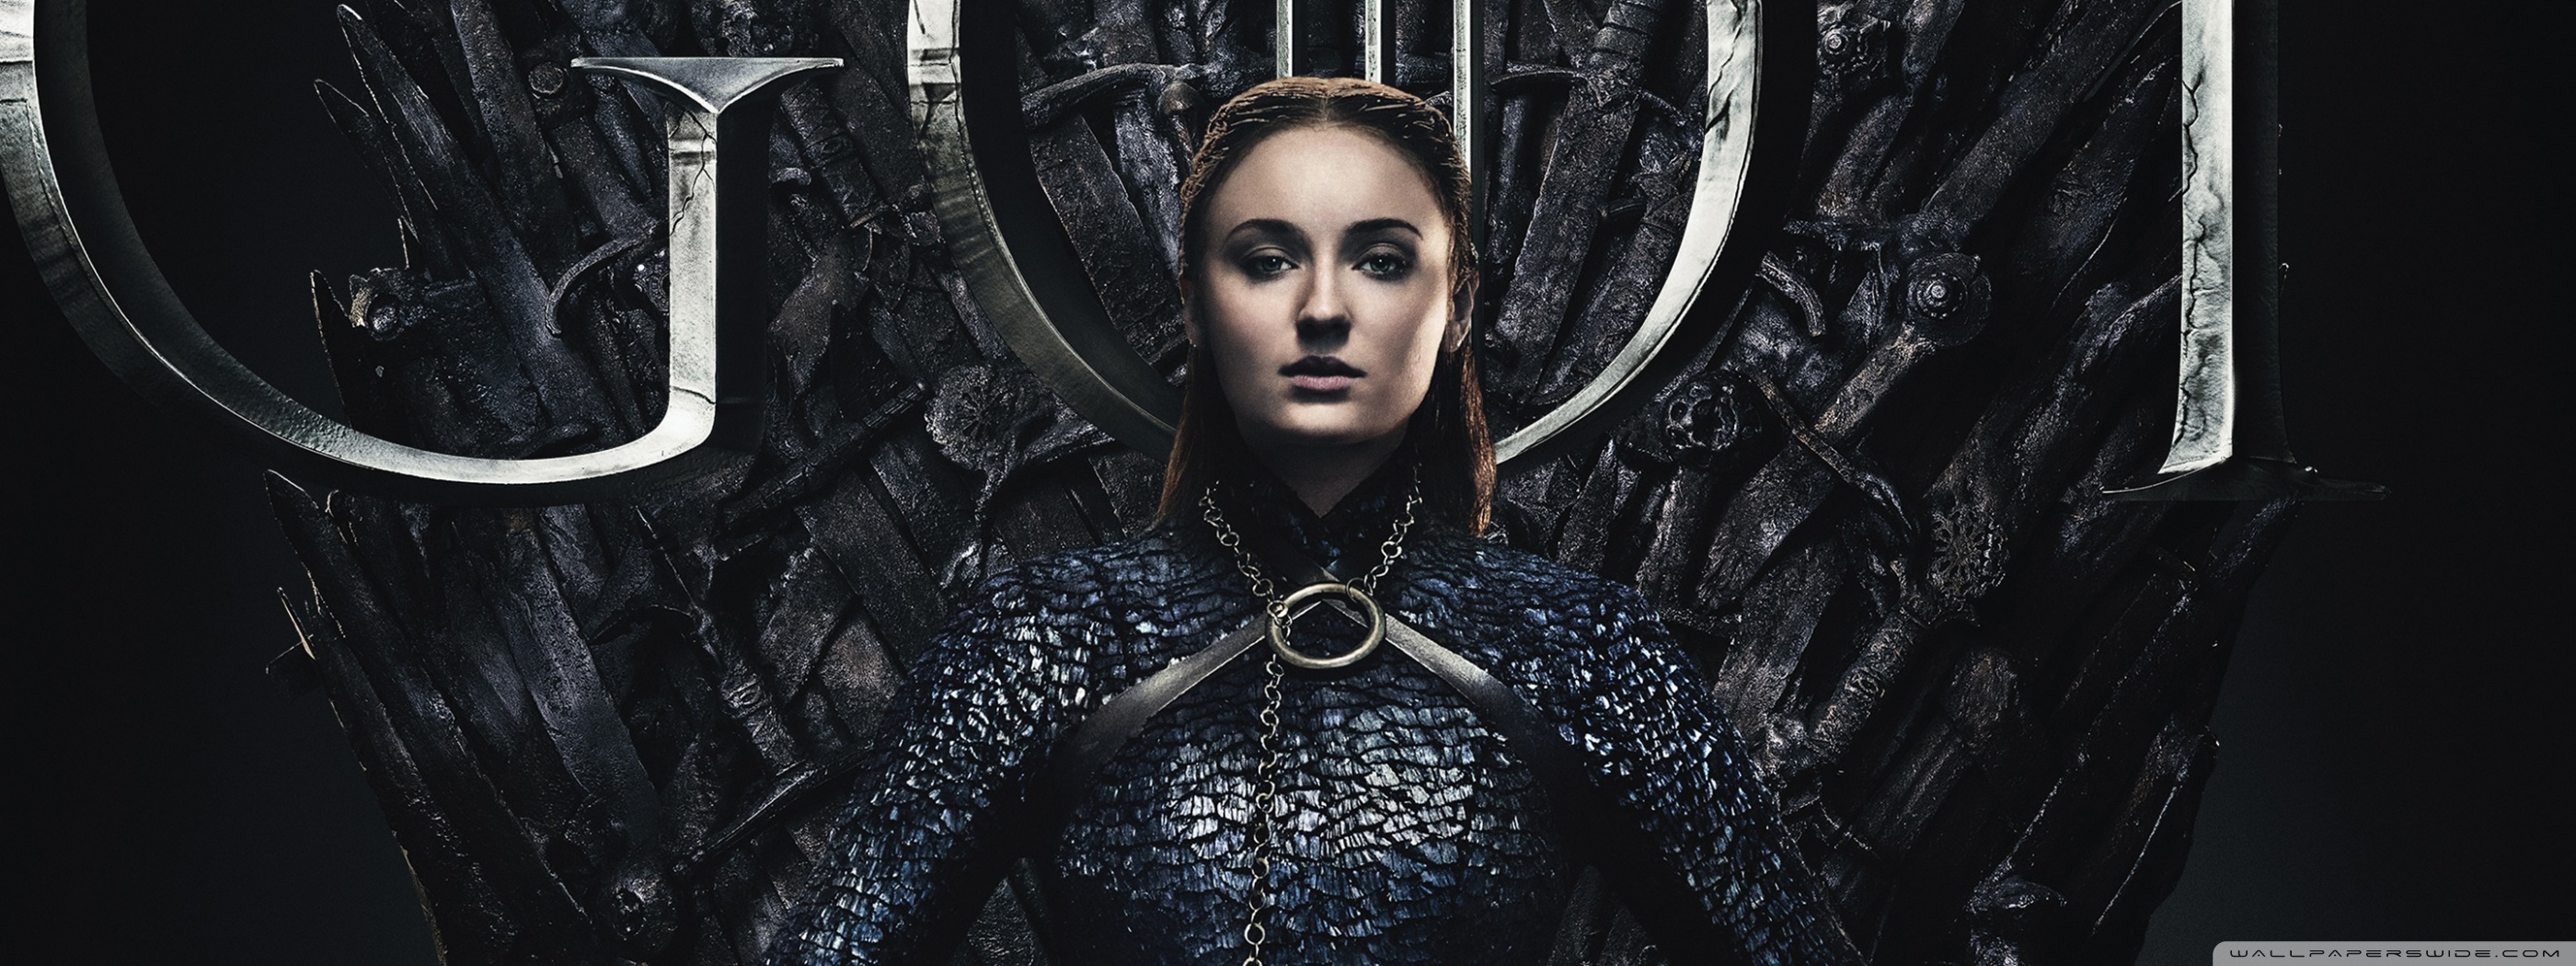 Game Of Thrones Season 8 Poster - HD Wallpaper